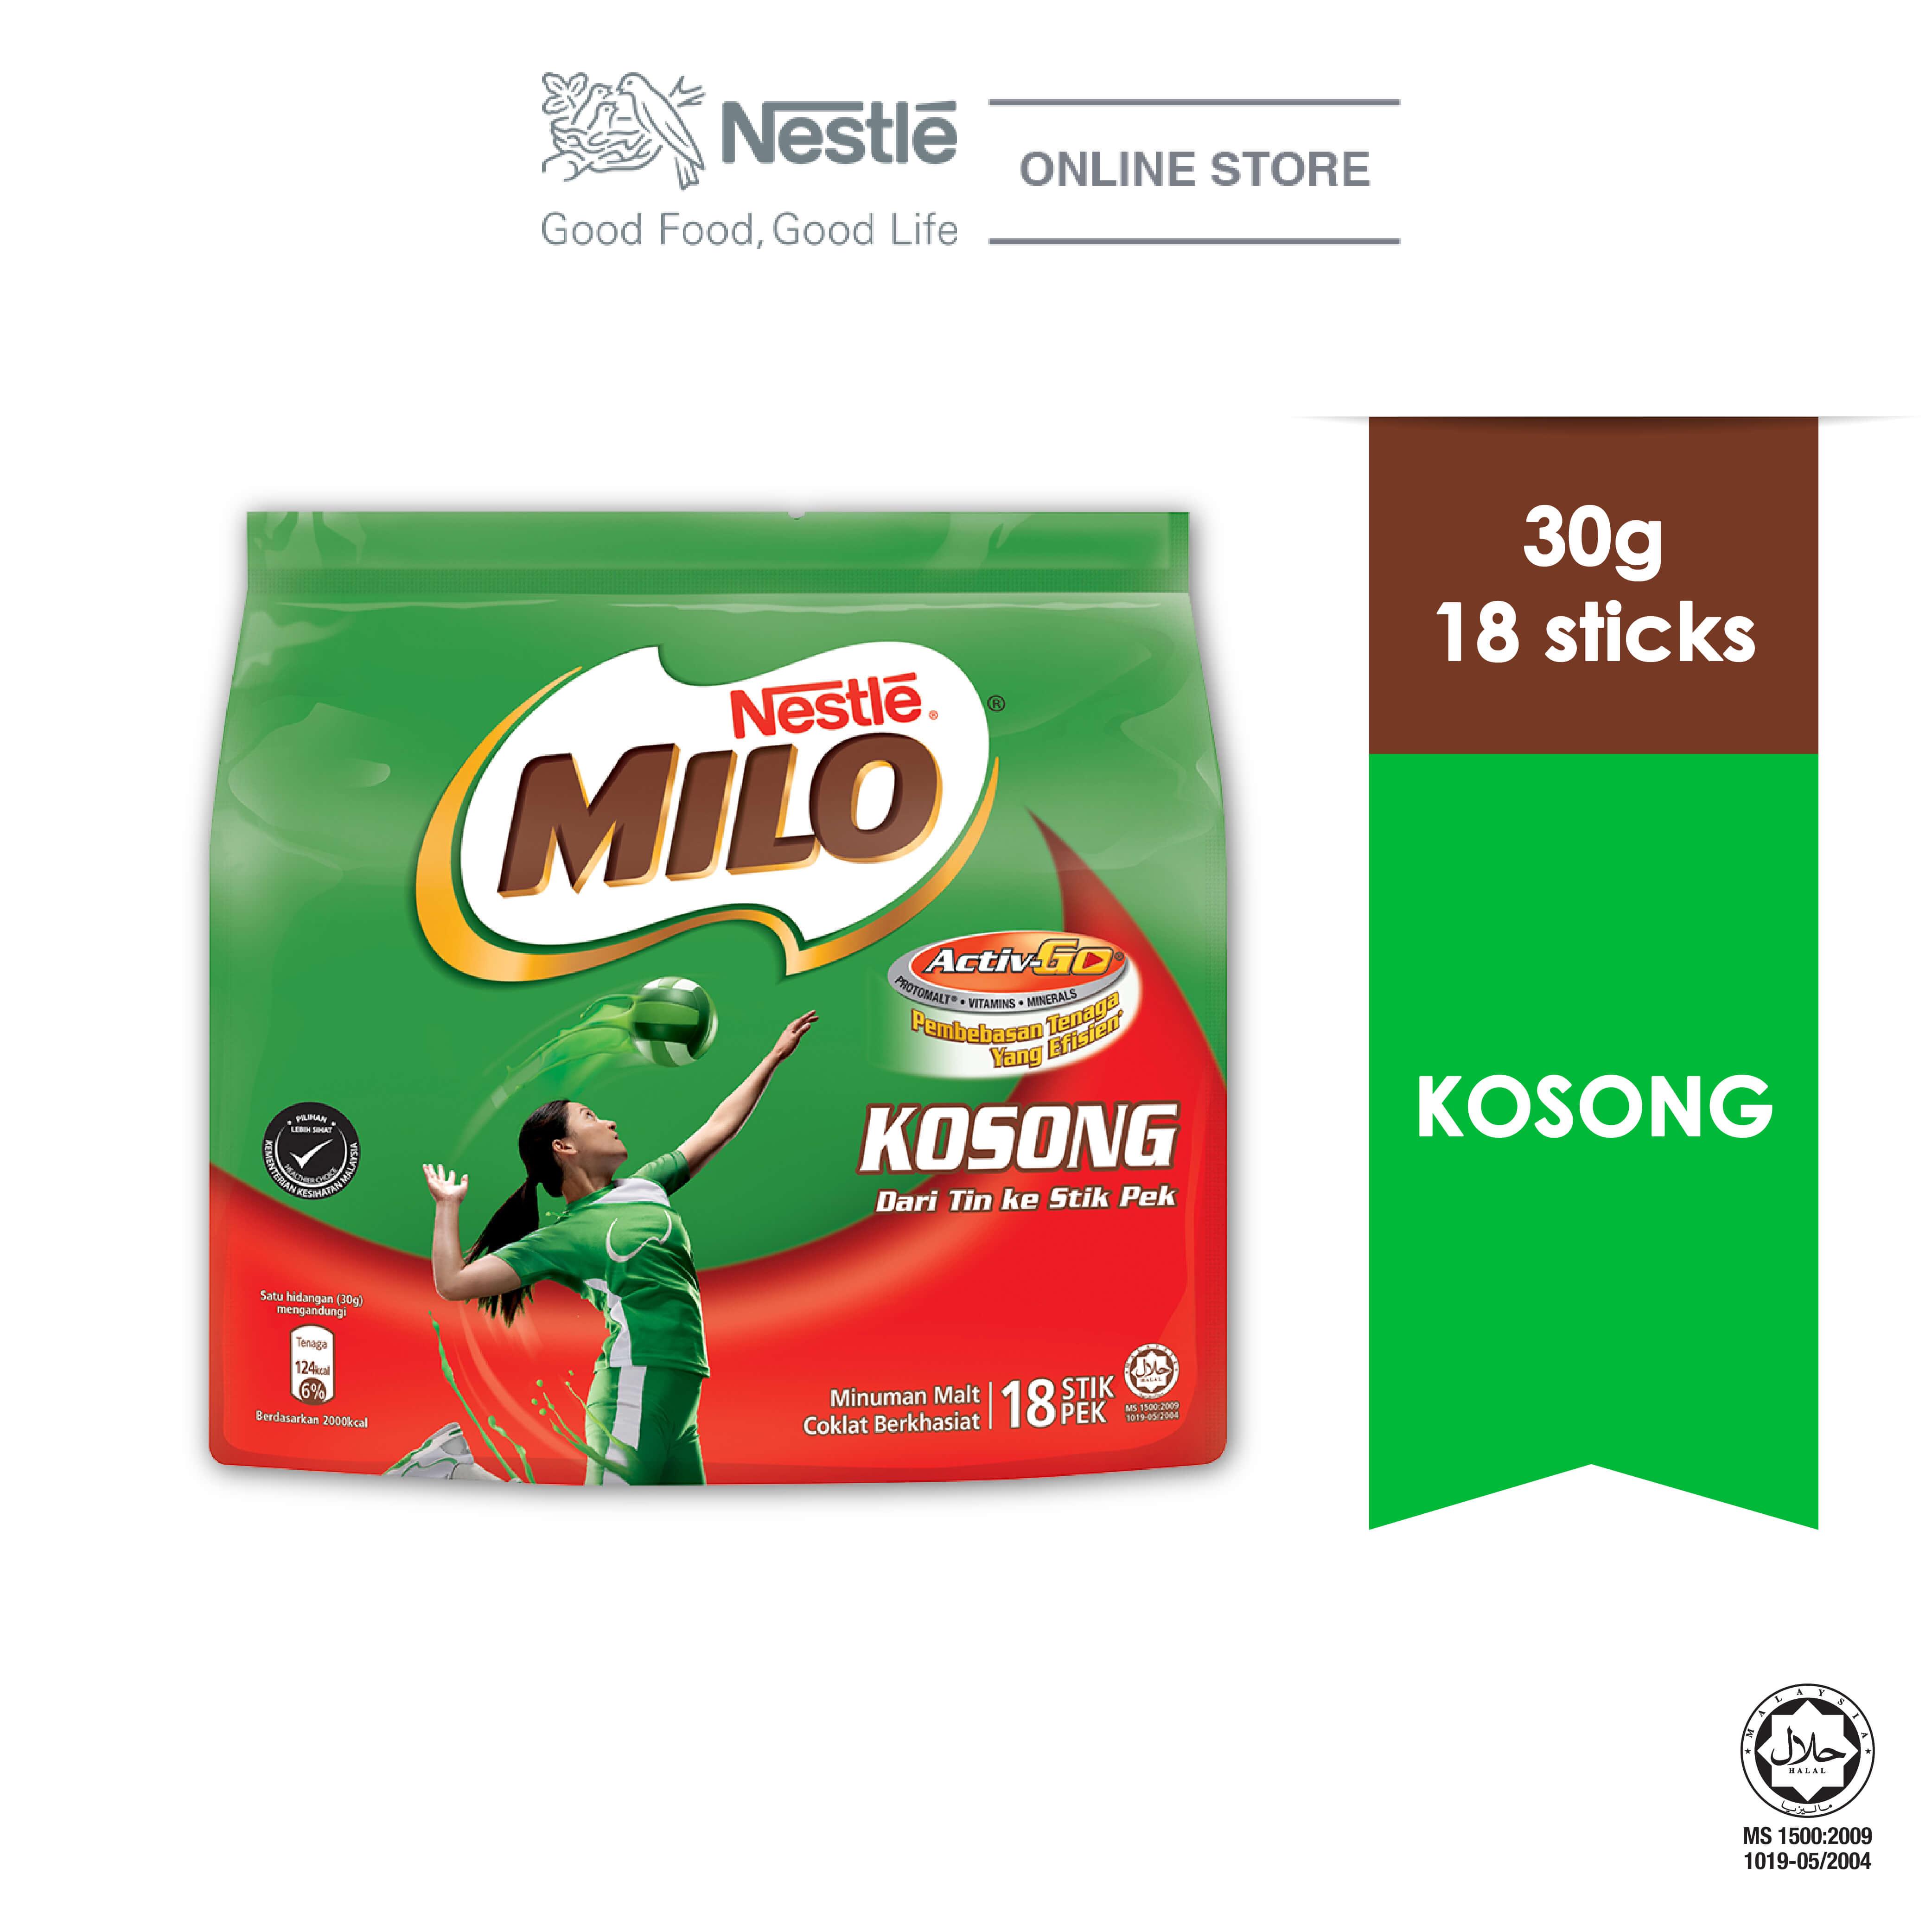 NESTLE MILO KOSONG ACTIV-GO 18 Sticks 30g